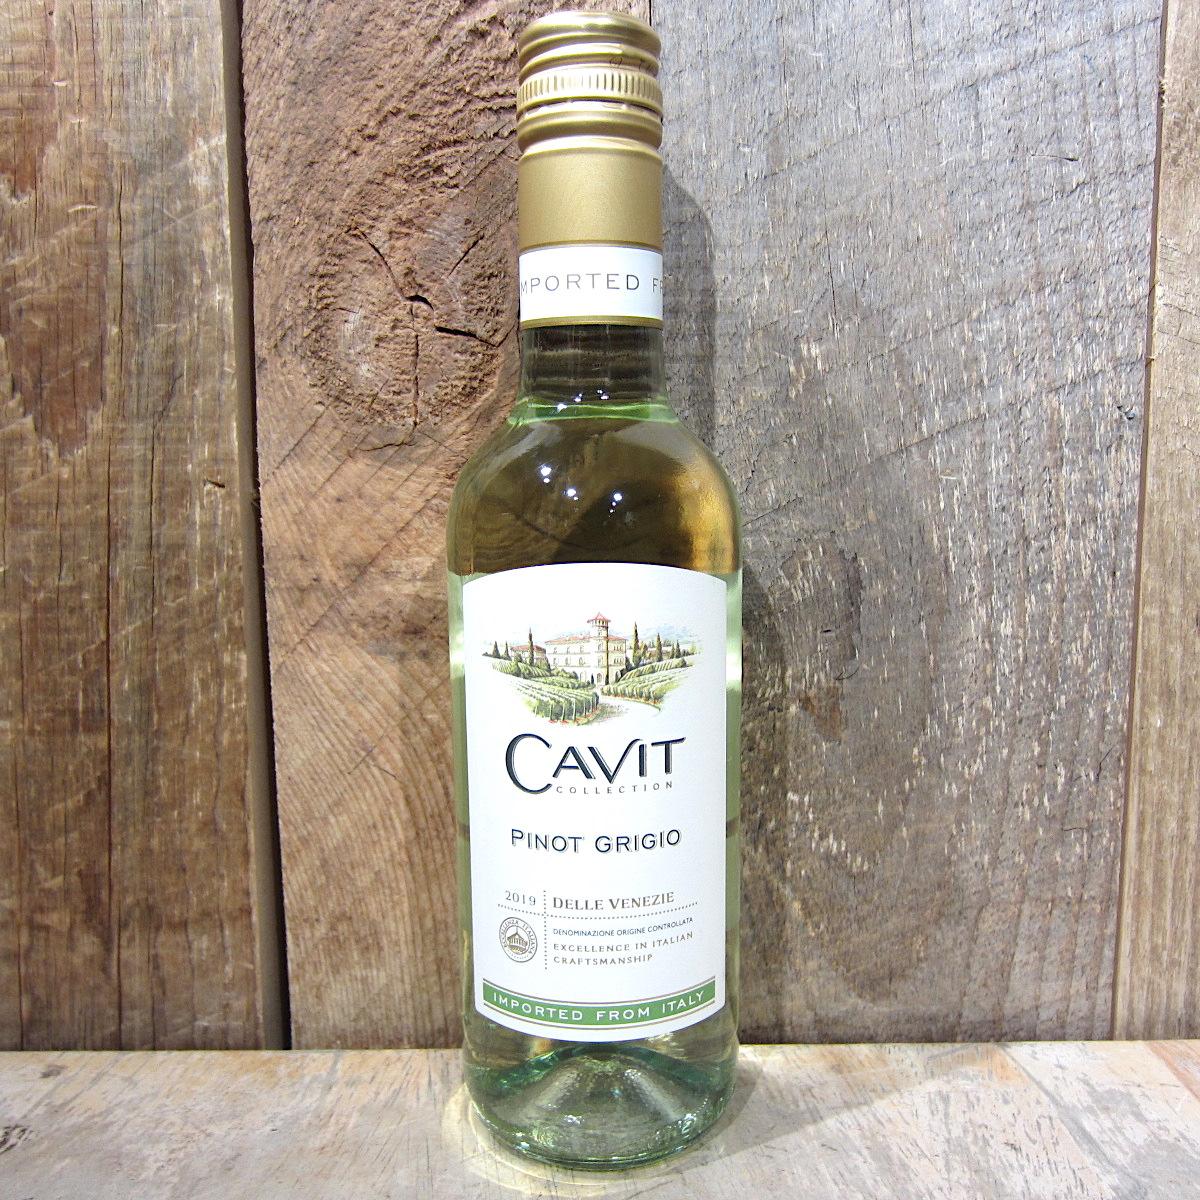 Cavit Pinot Grigio 375ml (Half Size Btl)